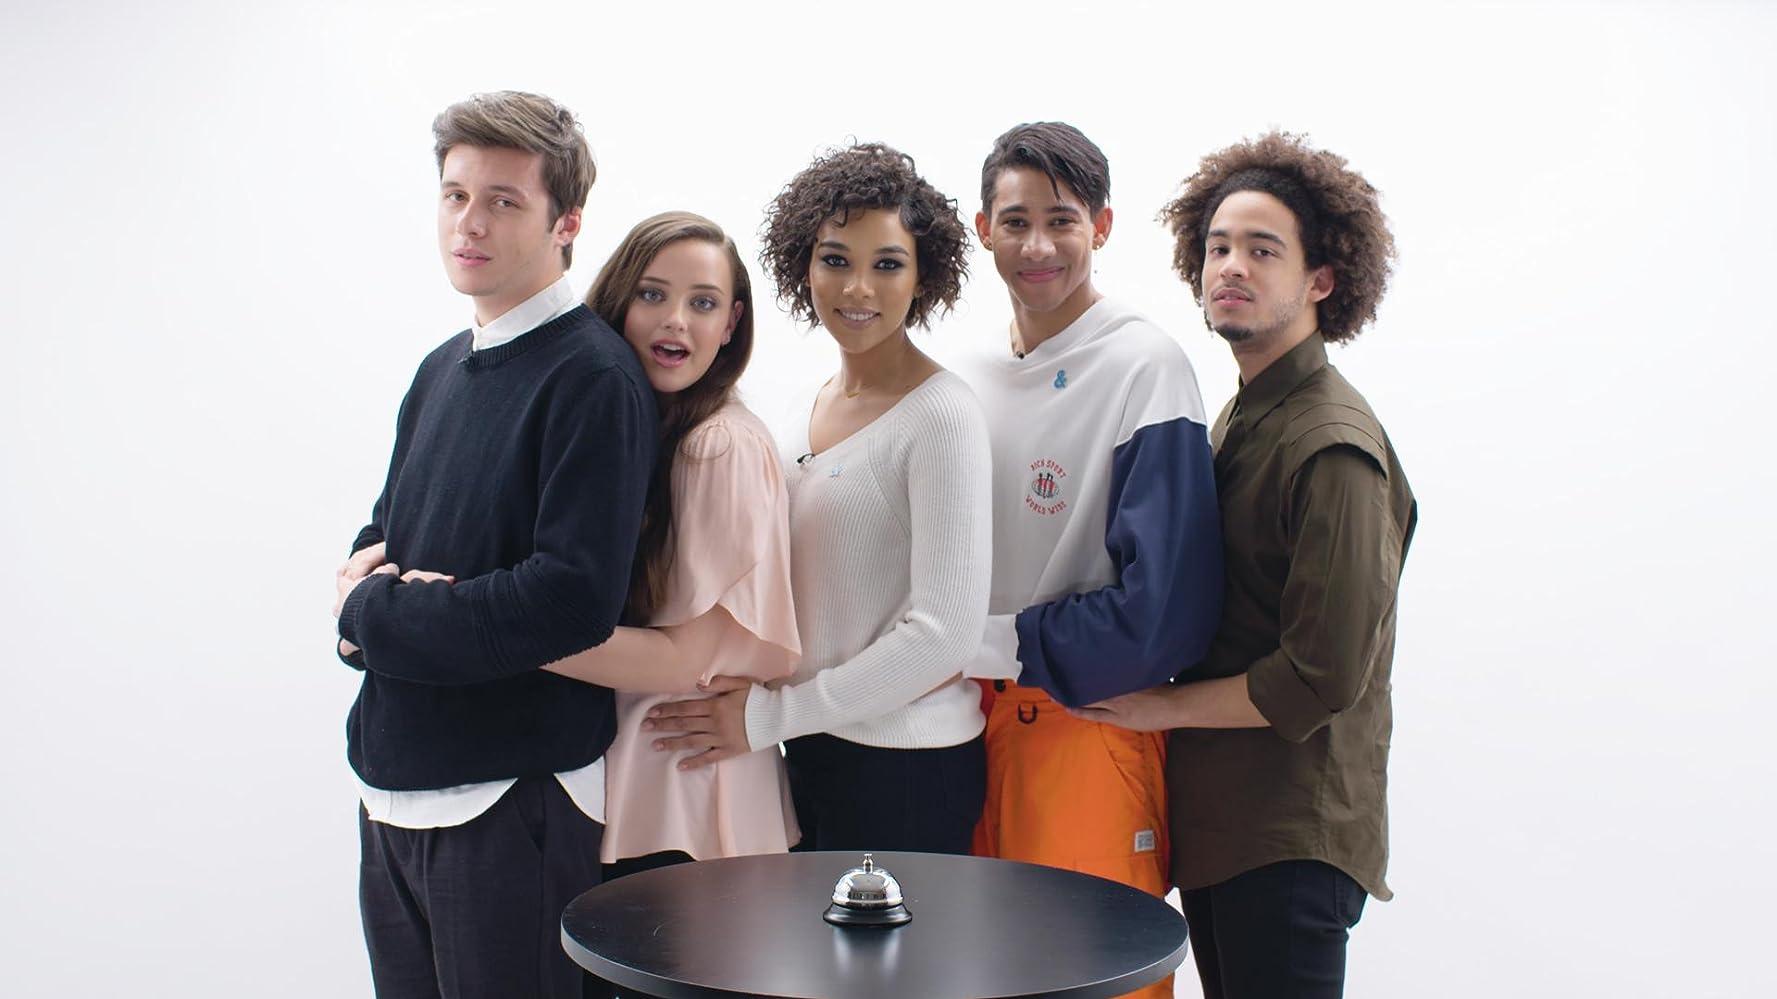 Keiynan Lonsdale, Alexandra Shipp, Nick Robinson, Jorge Lendeborg Jr., and Katherine Langford at an event for Love, Simon (2018)